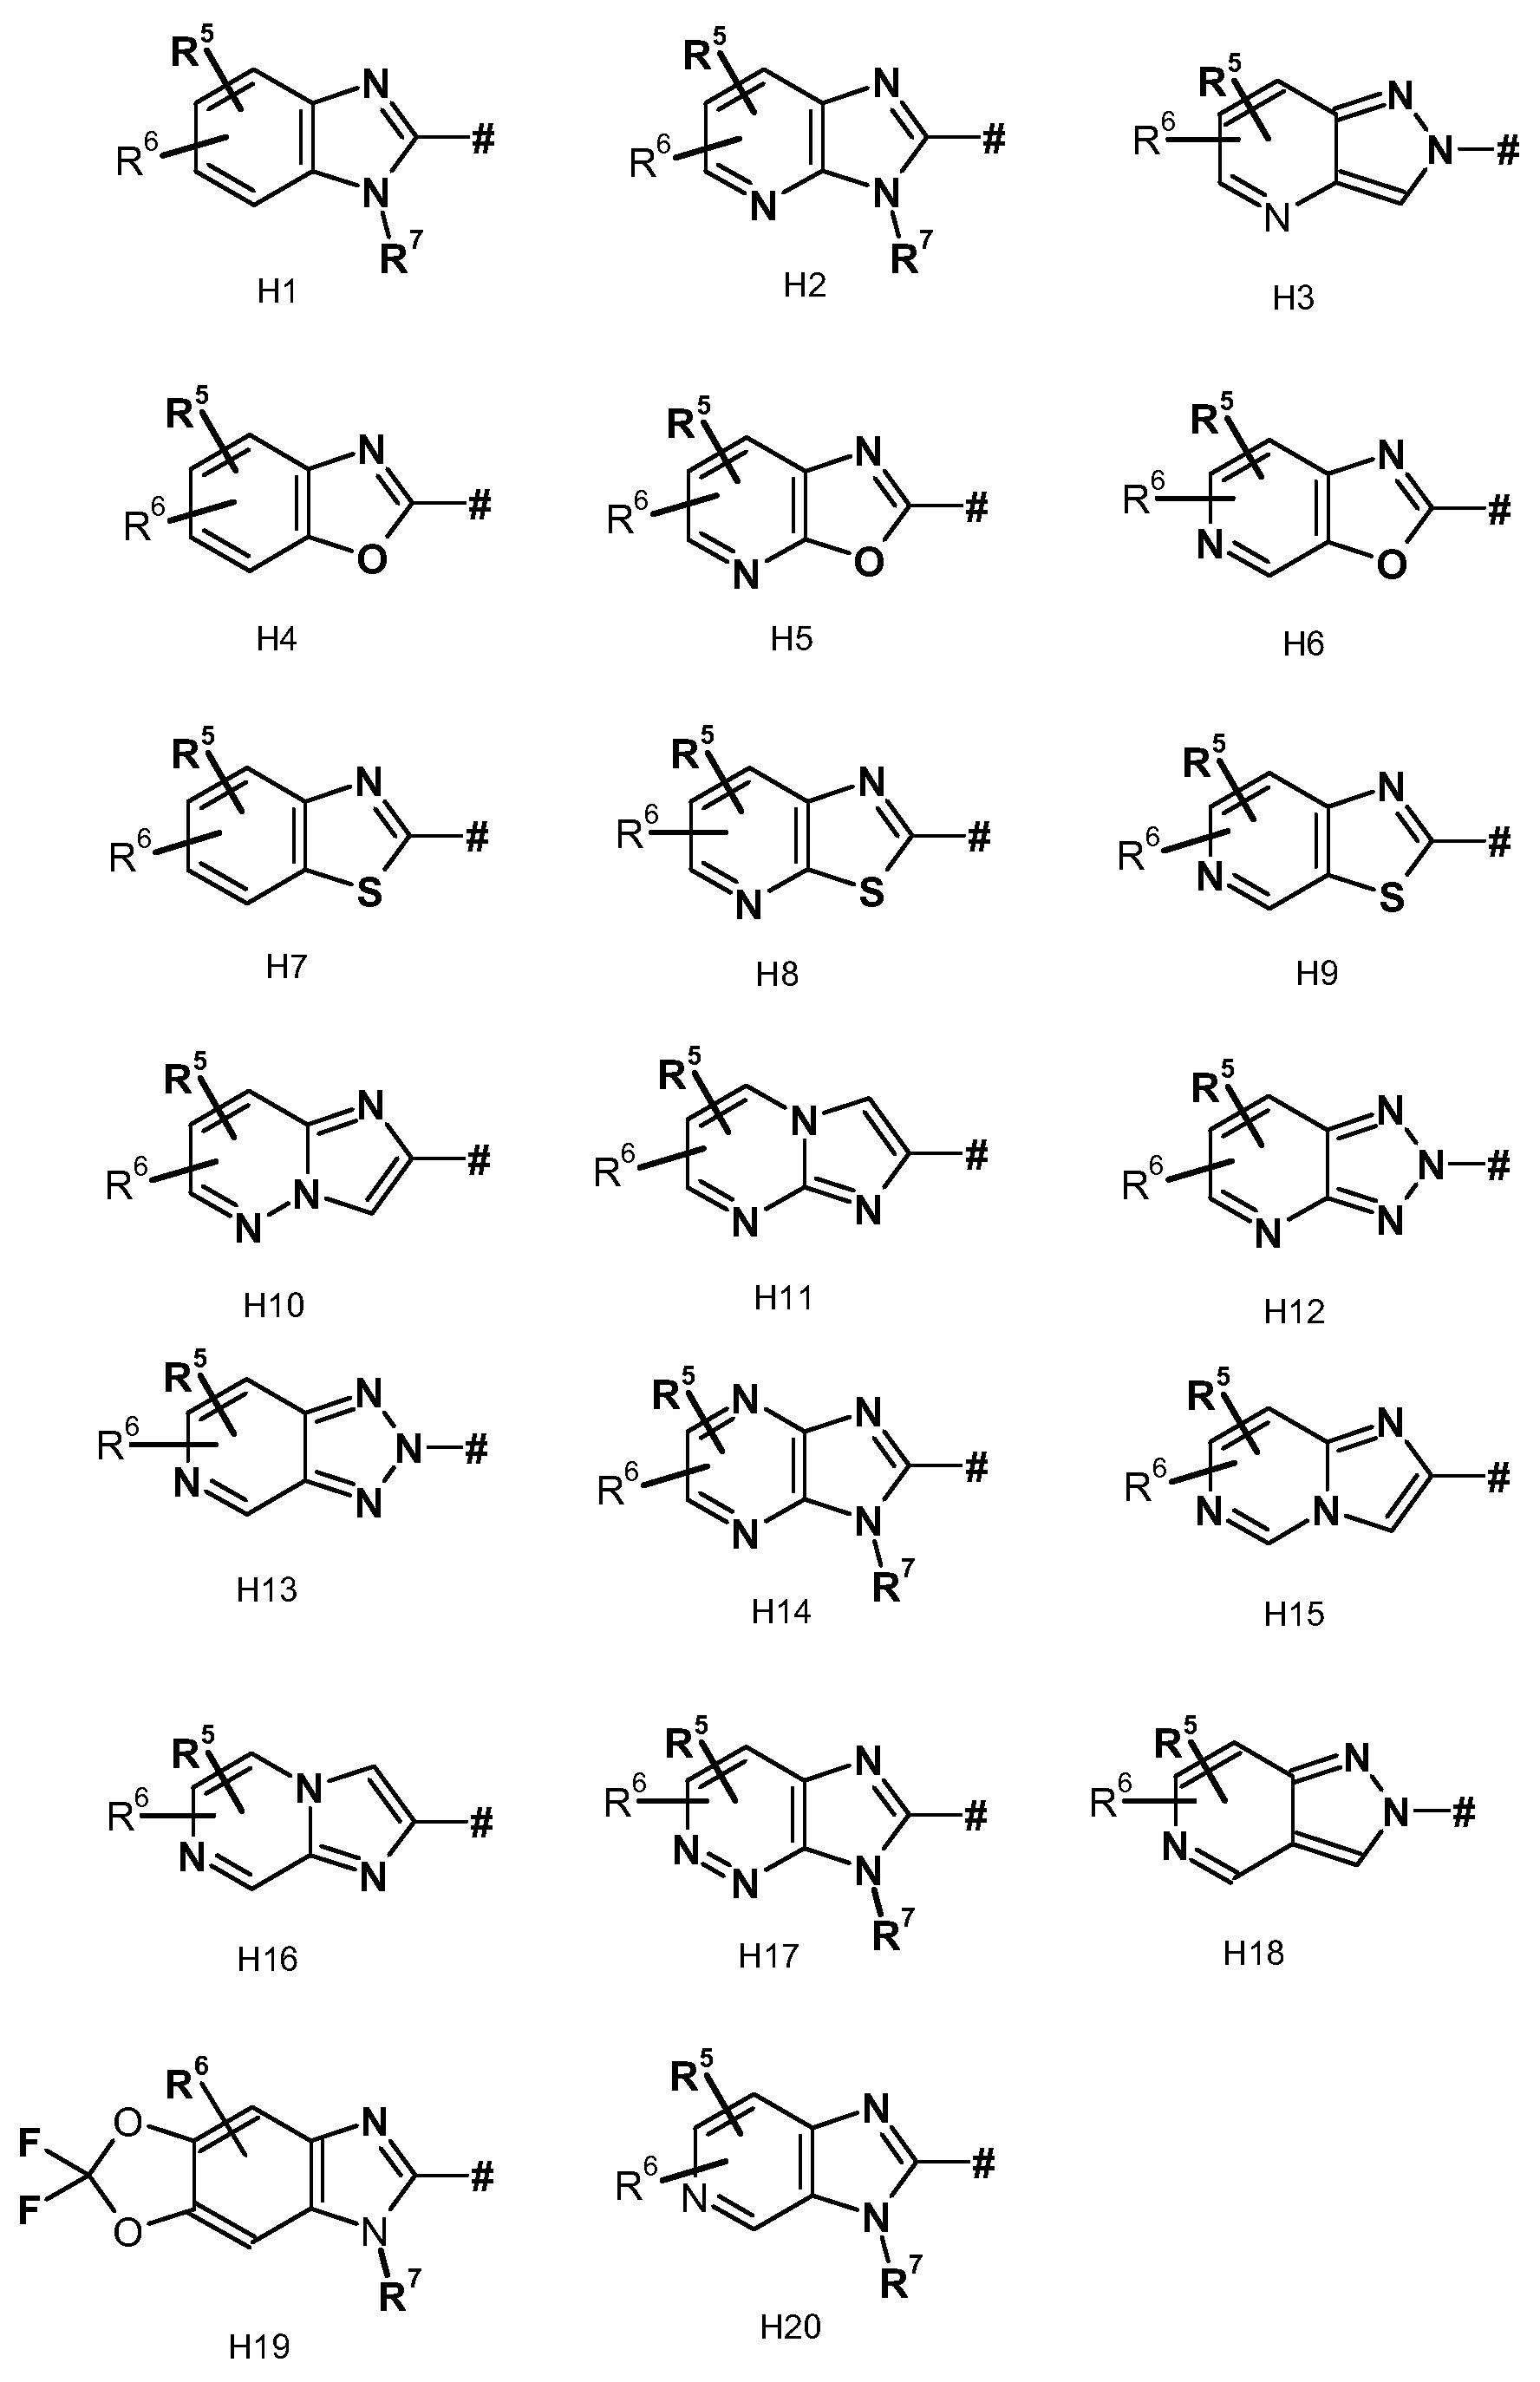 Kr20180098410a Heterocyclenes Derivatives As Pest Control Agents Google Patents